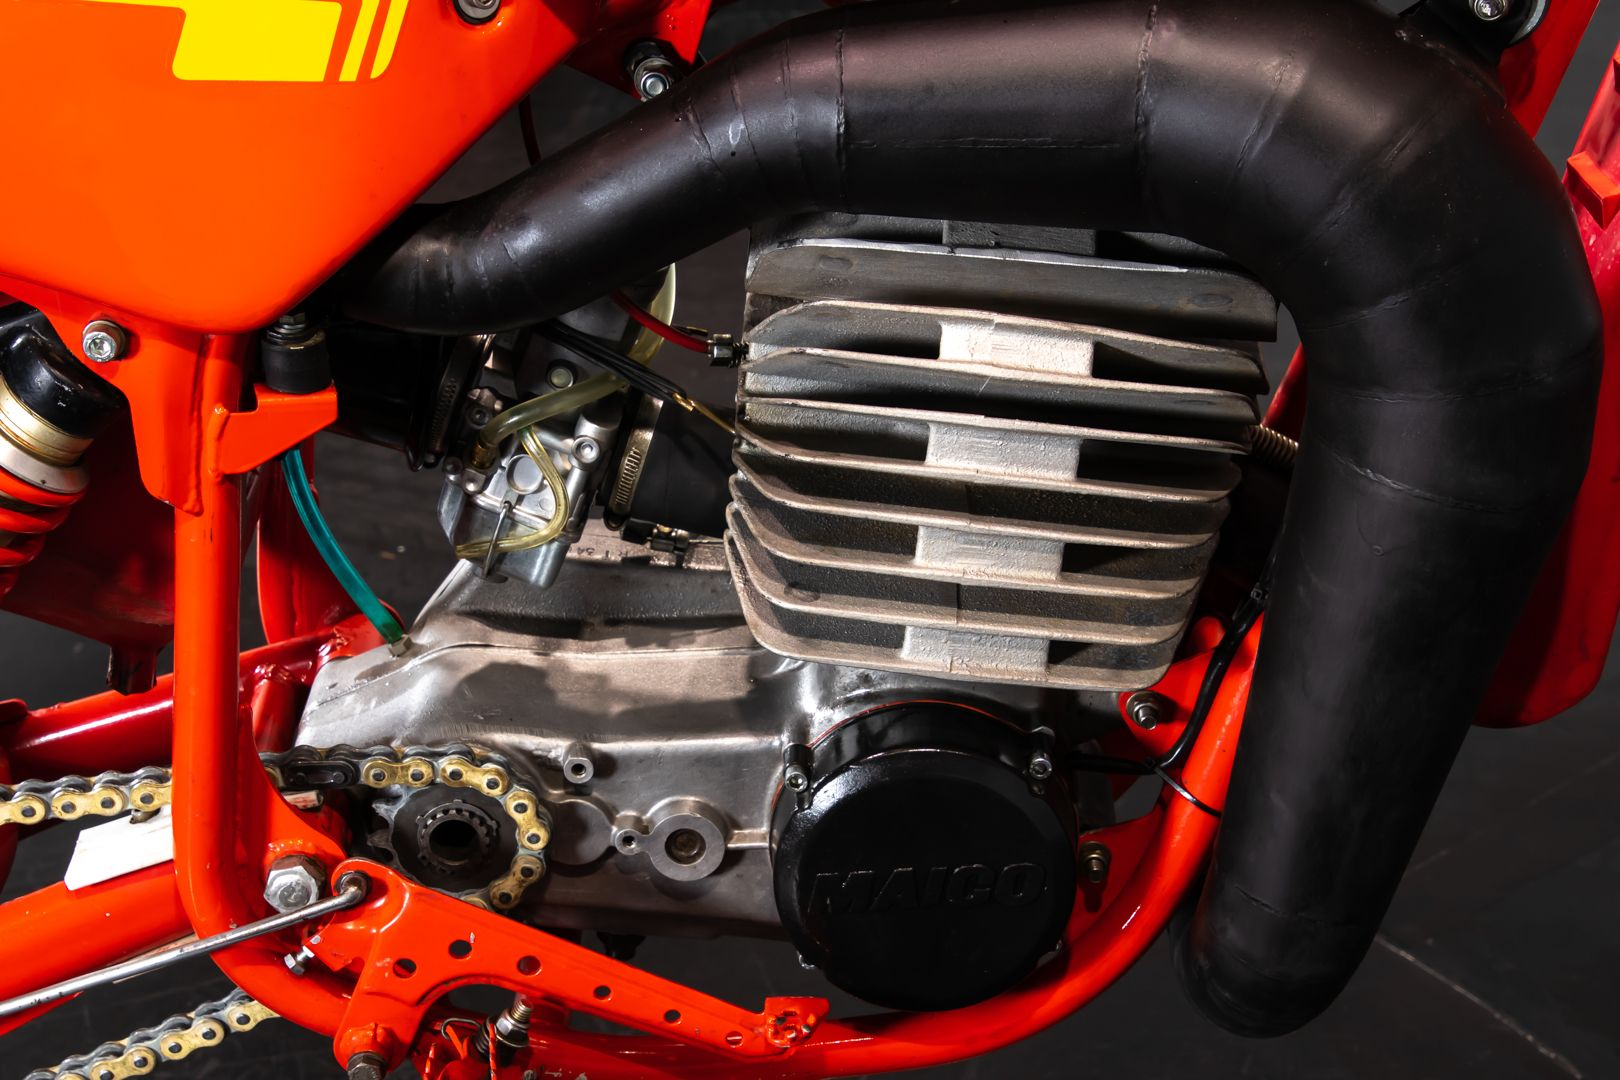 1981 Maico Cross 250 with 400cc Engine 26830